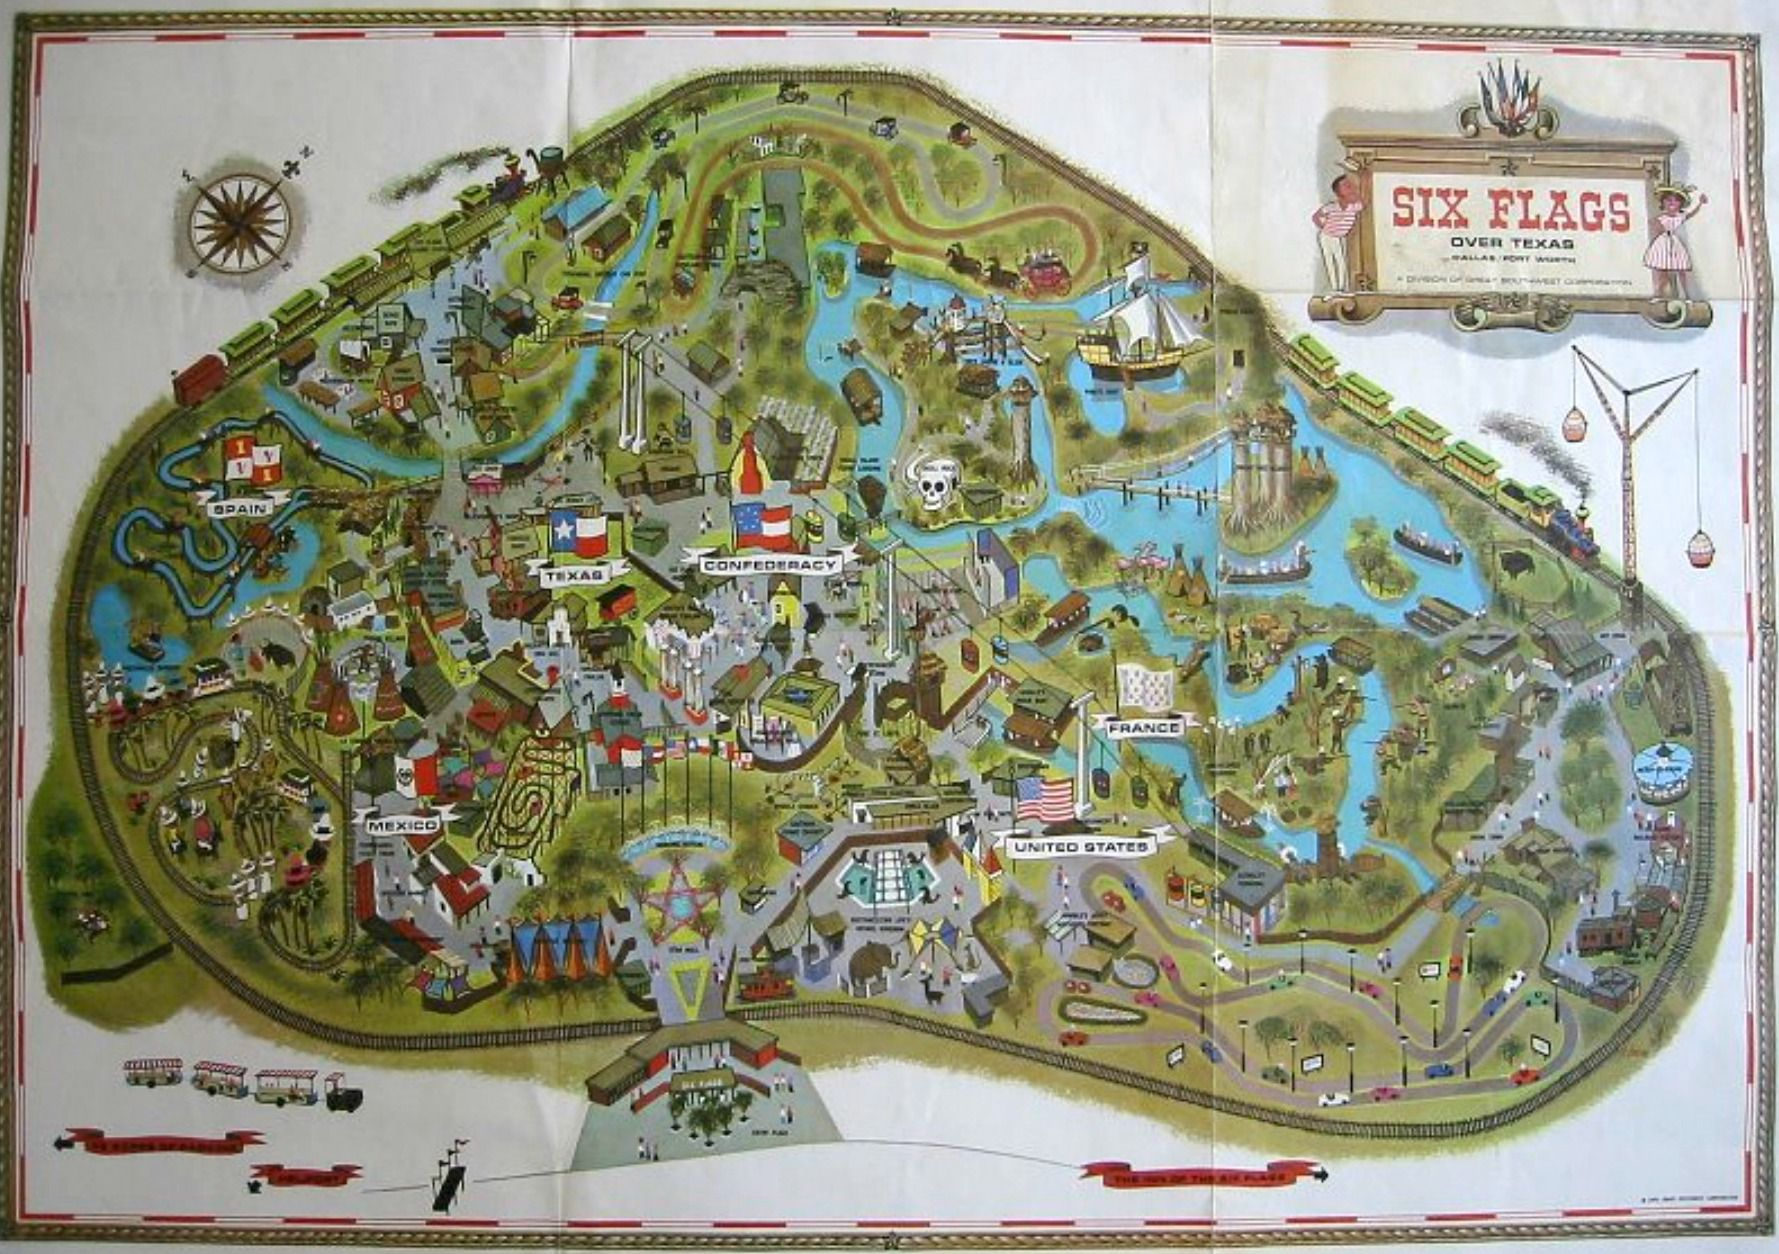 Six Flags Map Mid 1960s Jpg 1 779 1 254 Pixels Six Flags Six Flags Over Texas Flag